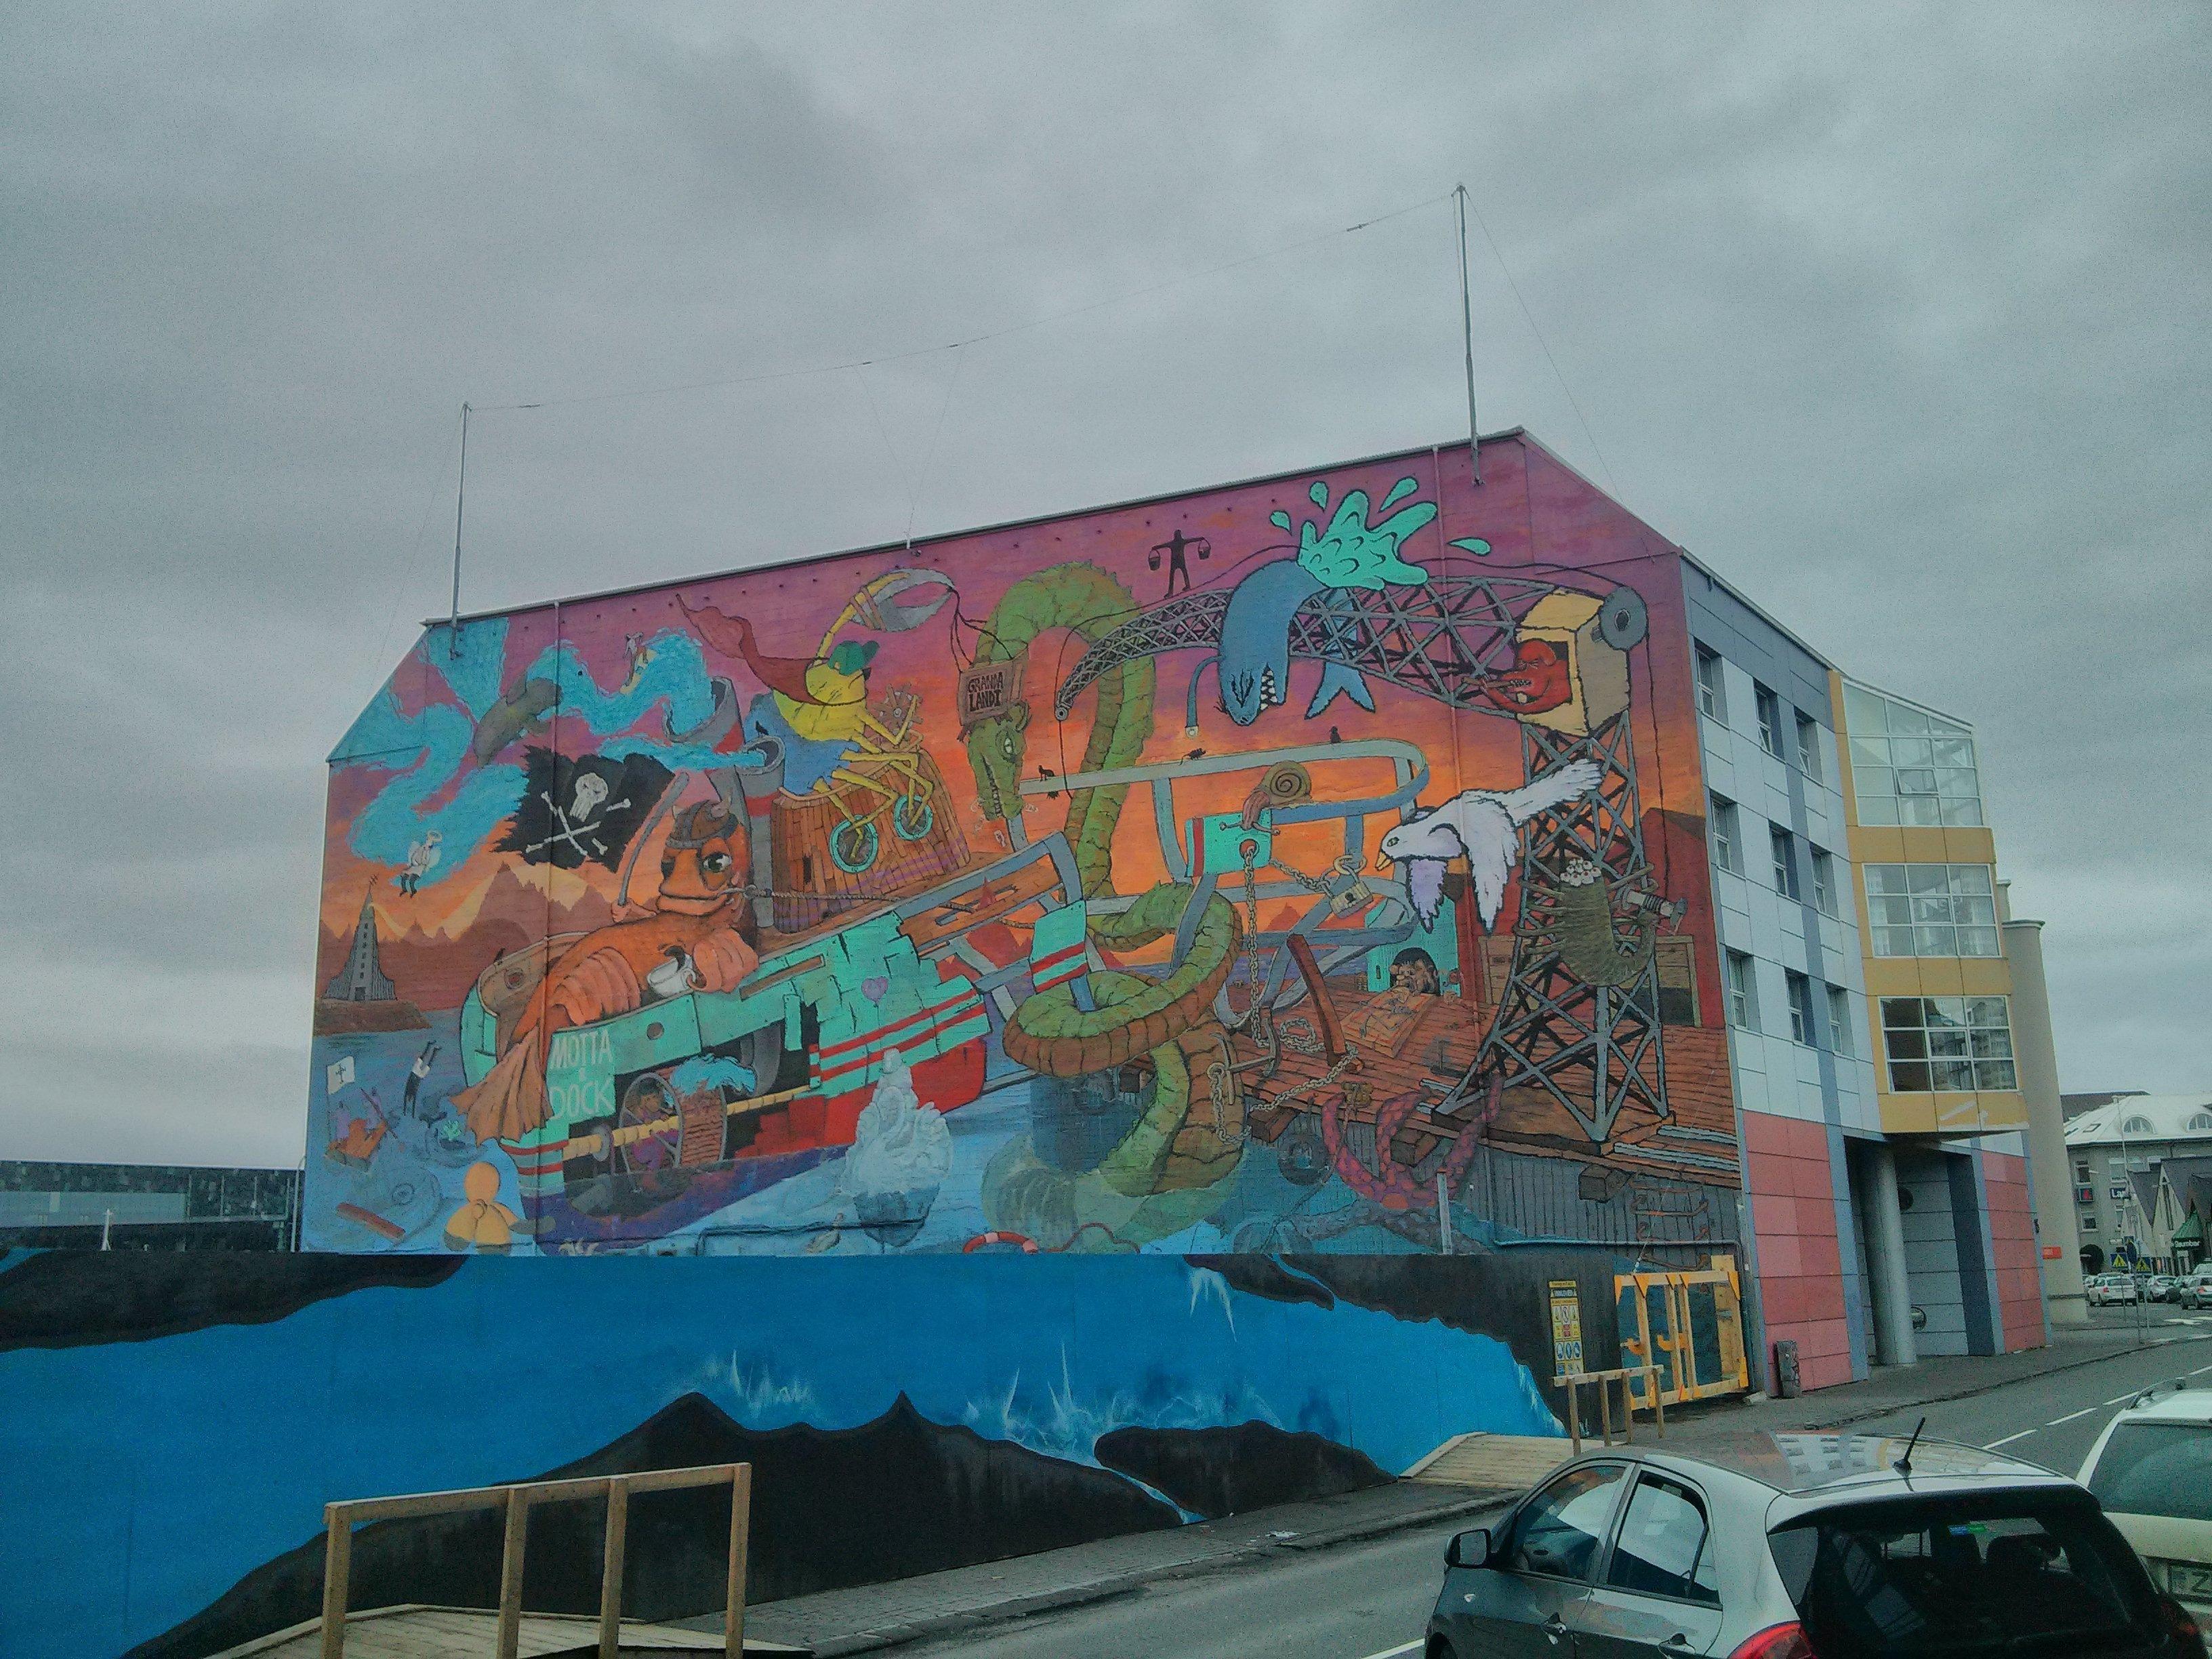 mural_pirate_port